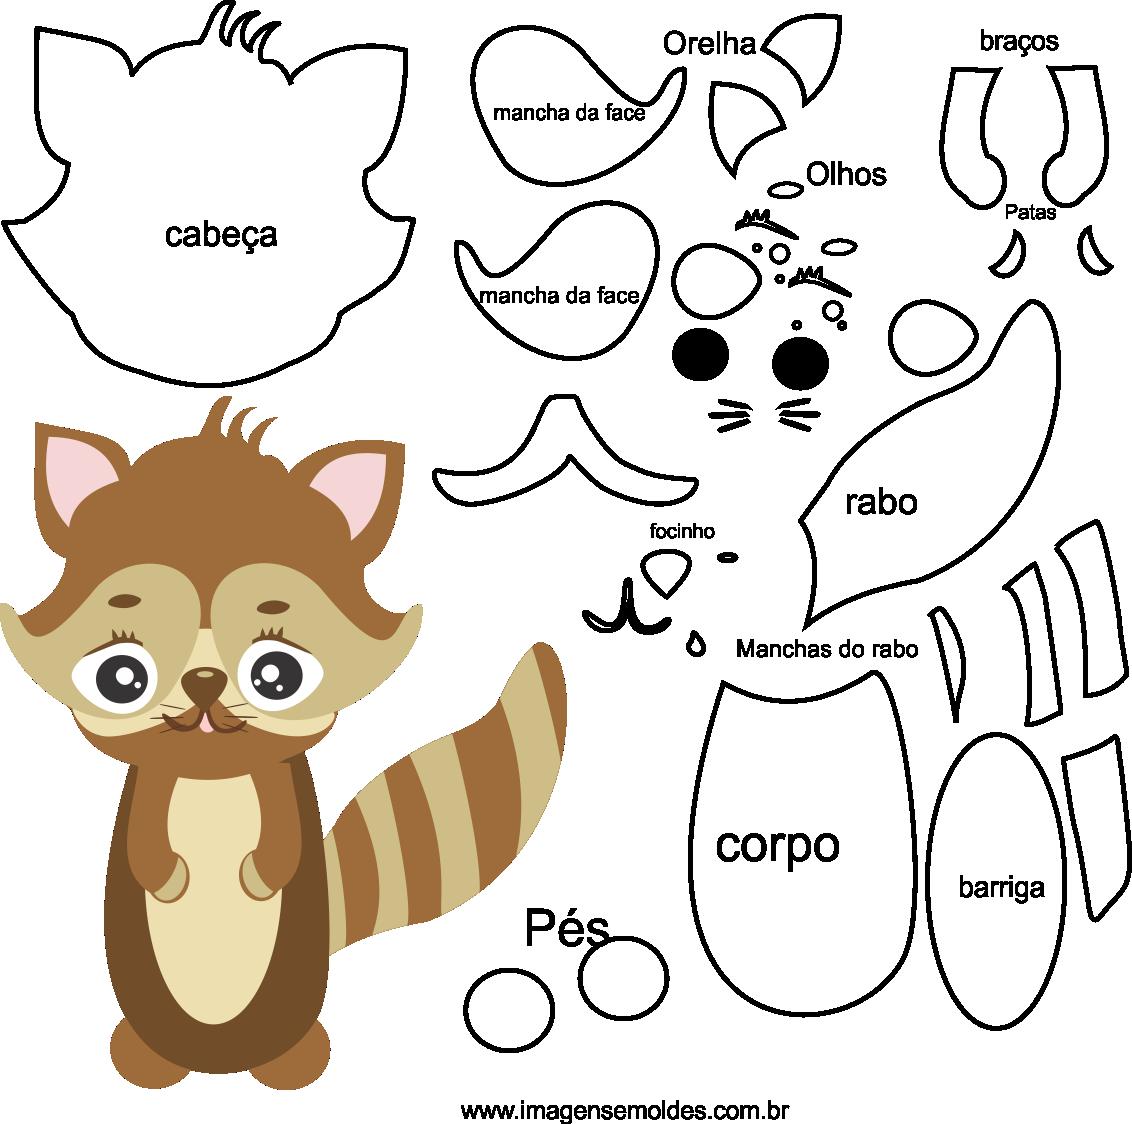 Molde de Animal , esquilo 1 para feltro, eva e artesanato, Eichhörnchenform, molde de ardilla, squirrel mold